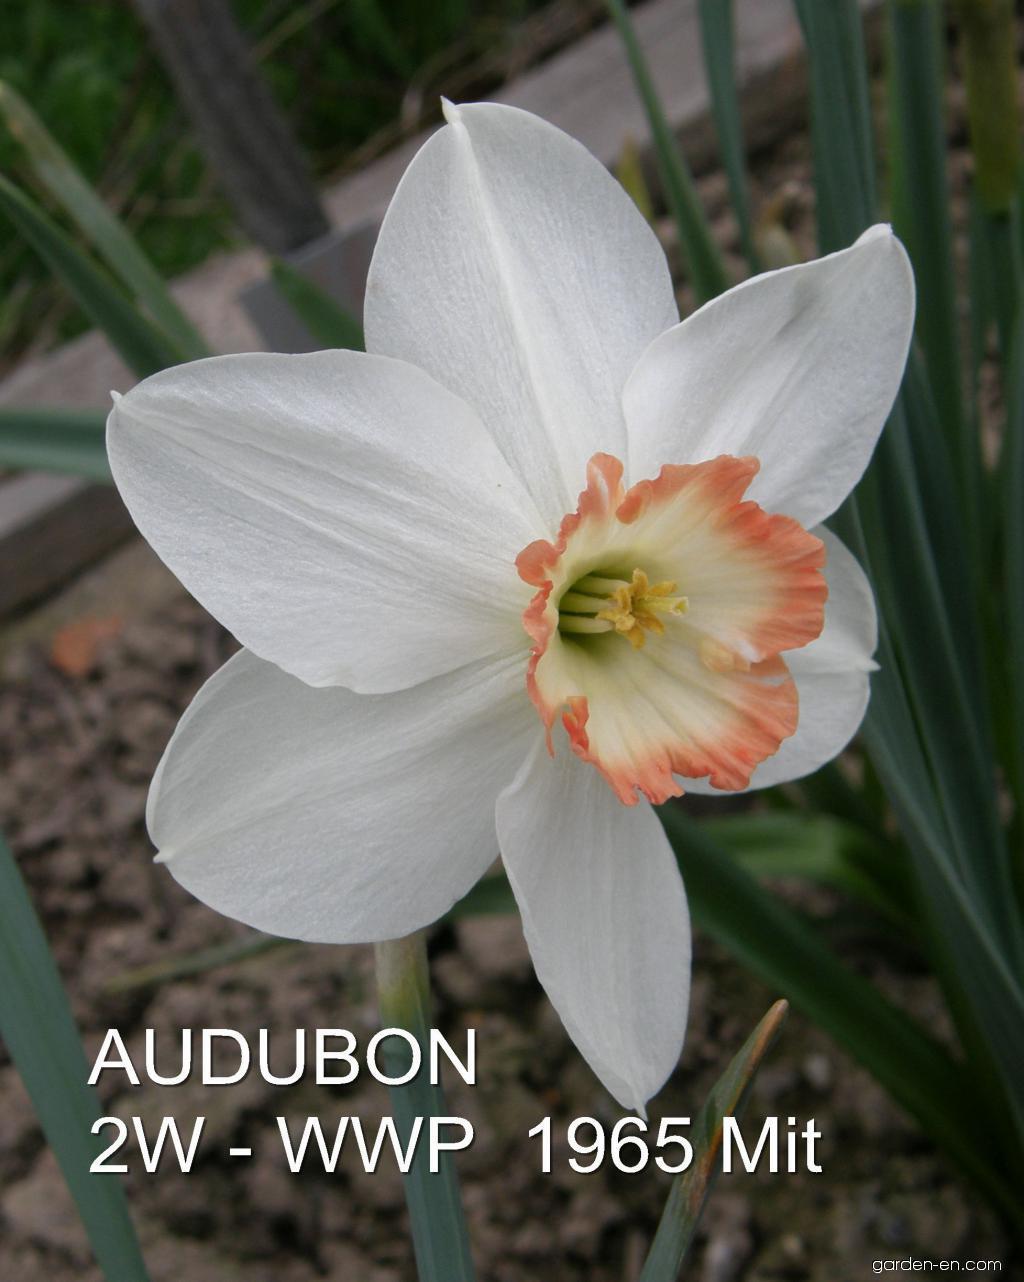 Daffodil - Narcissus Audubon